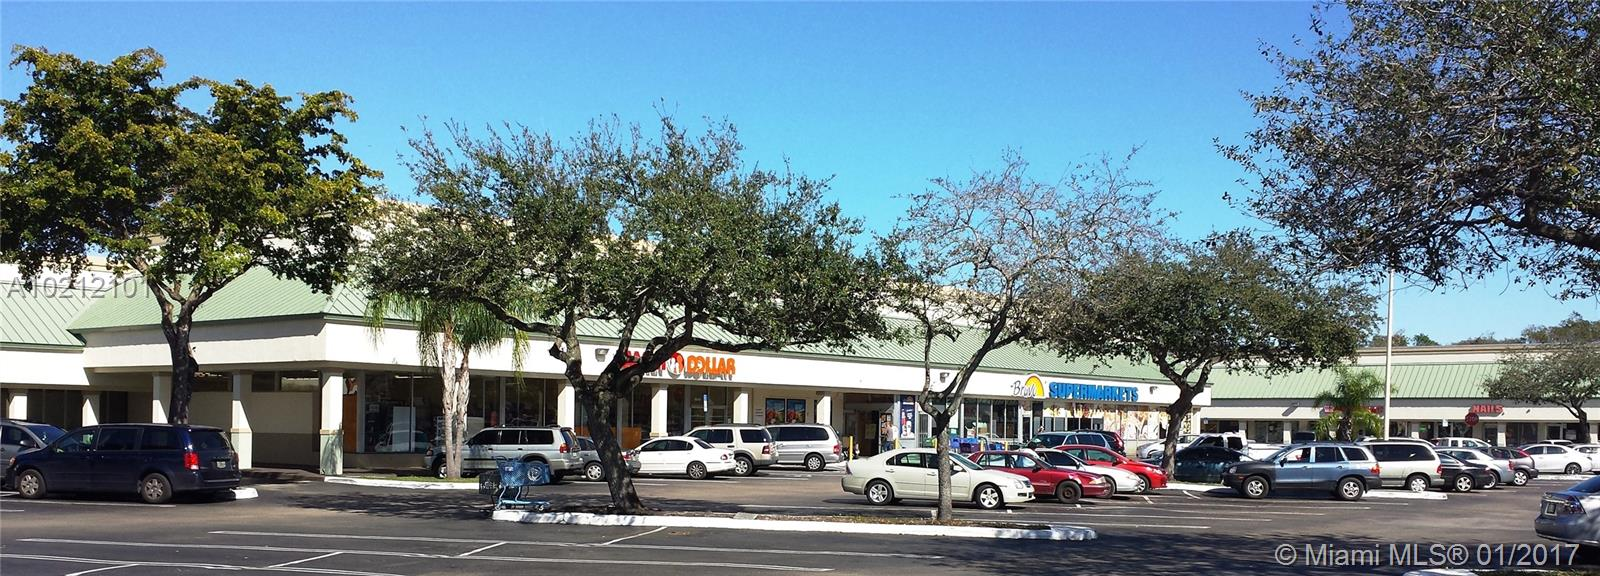 3019 Johnson St, Hollywood, FL 33021